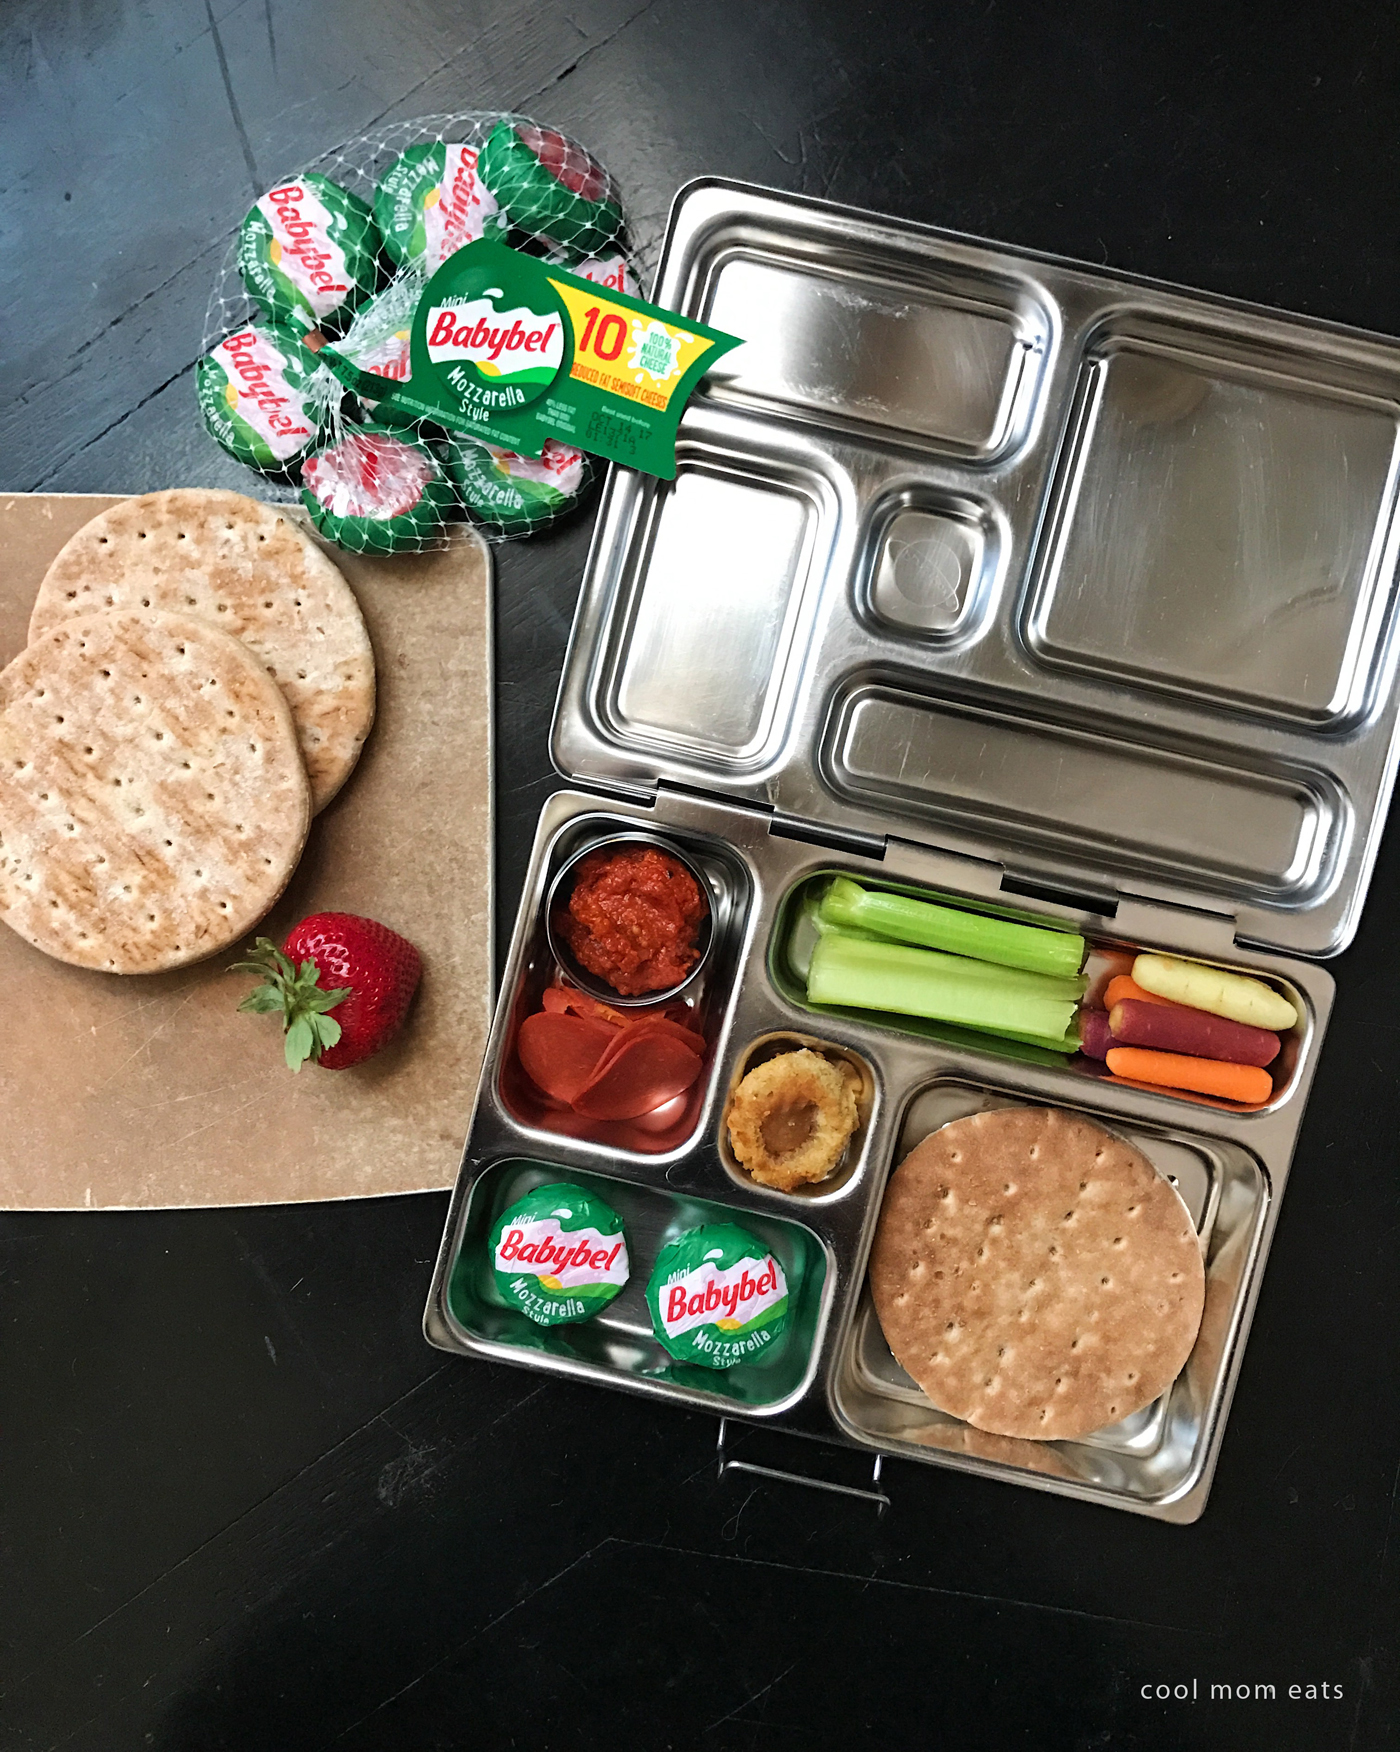 Fun school lunch ideas: Easy Lunch Box Pizza recipe with Mini Babybel | Cool Mom Eats [sponsor]